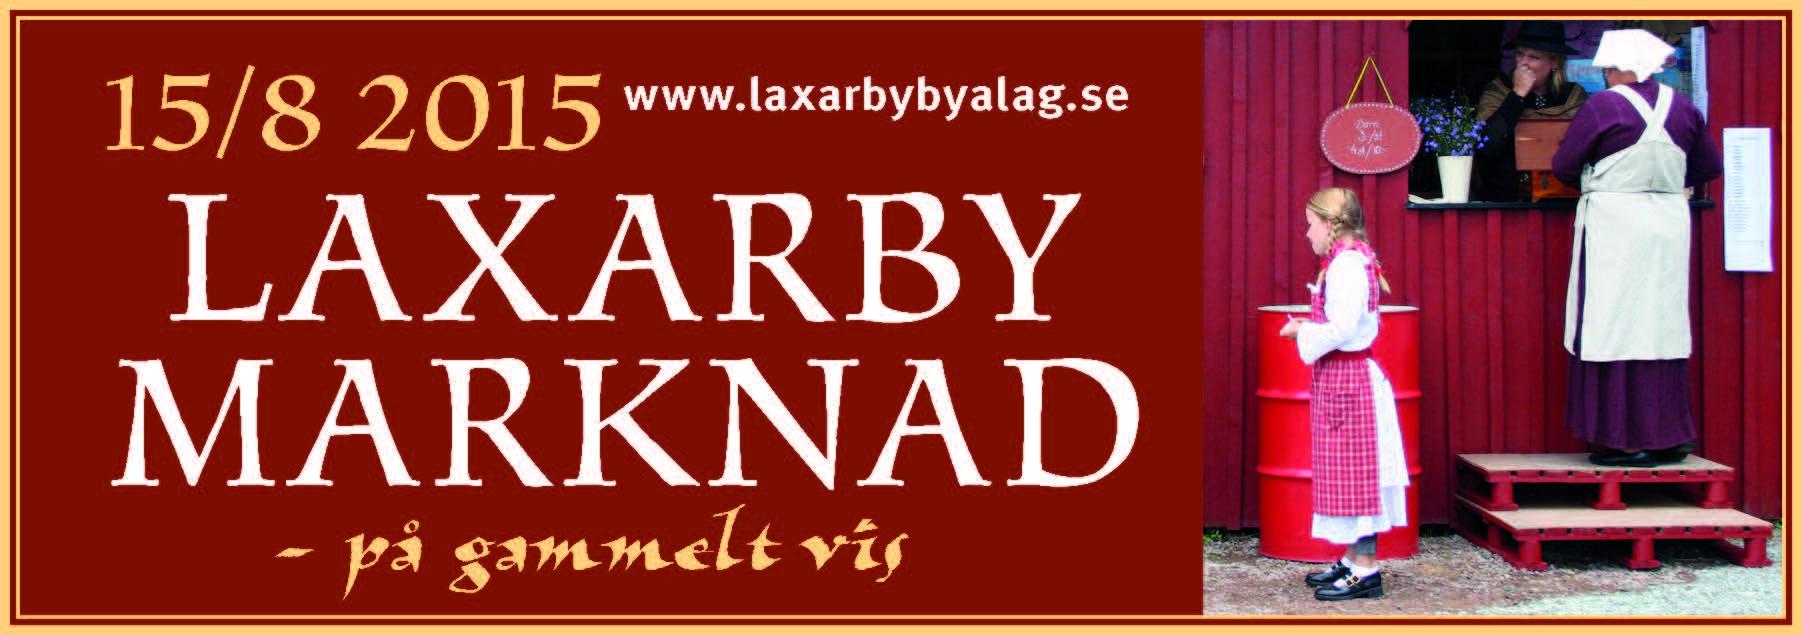 Laxarby marknads webbhead